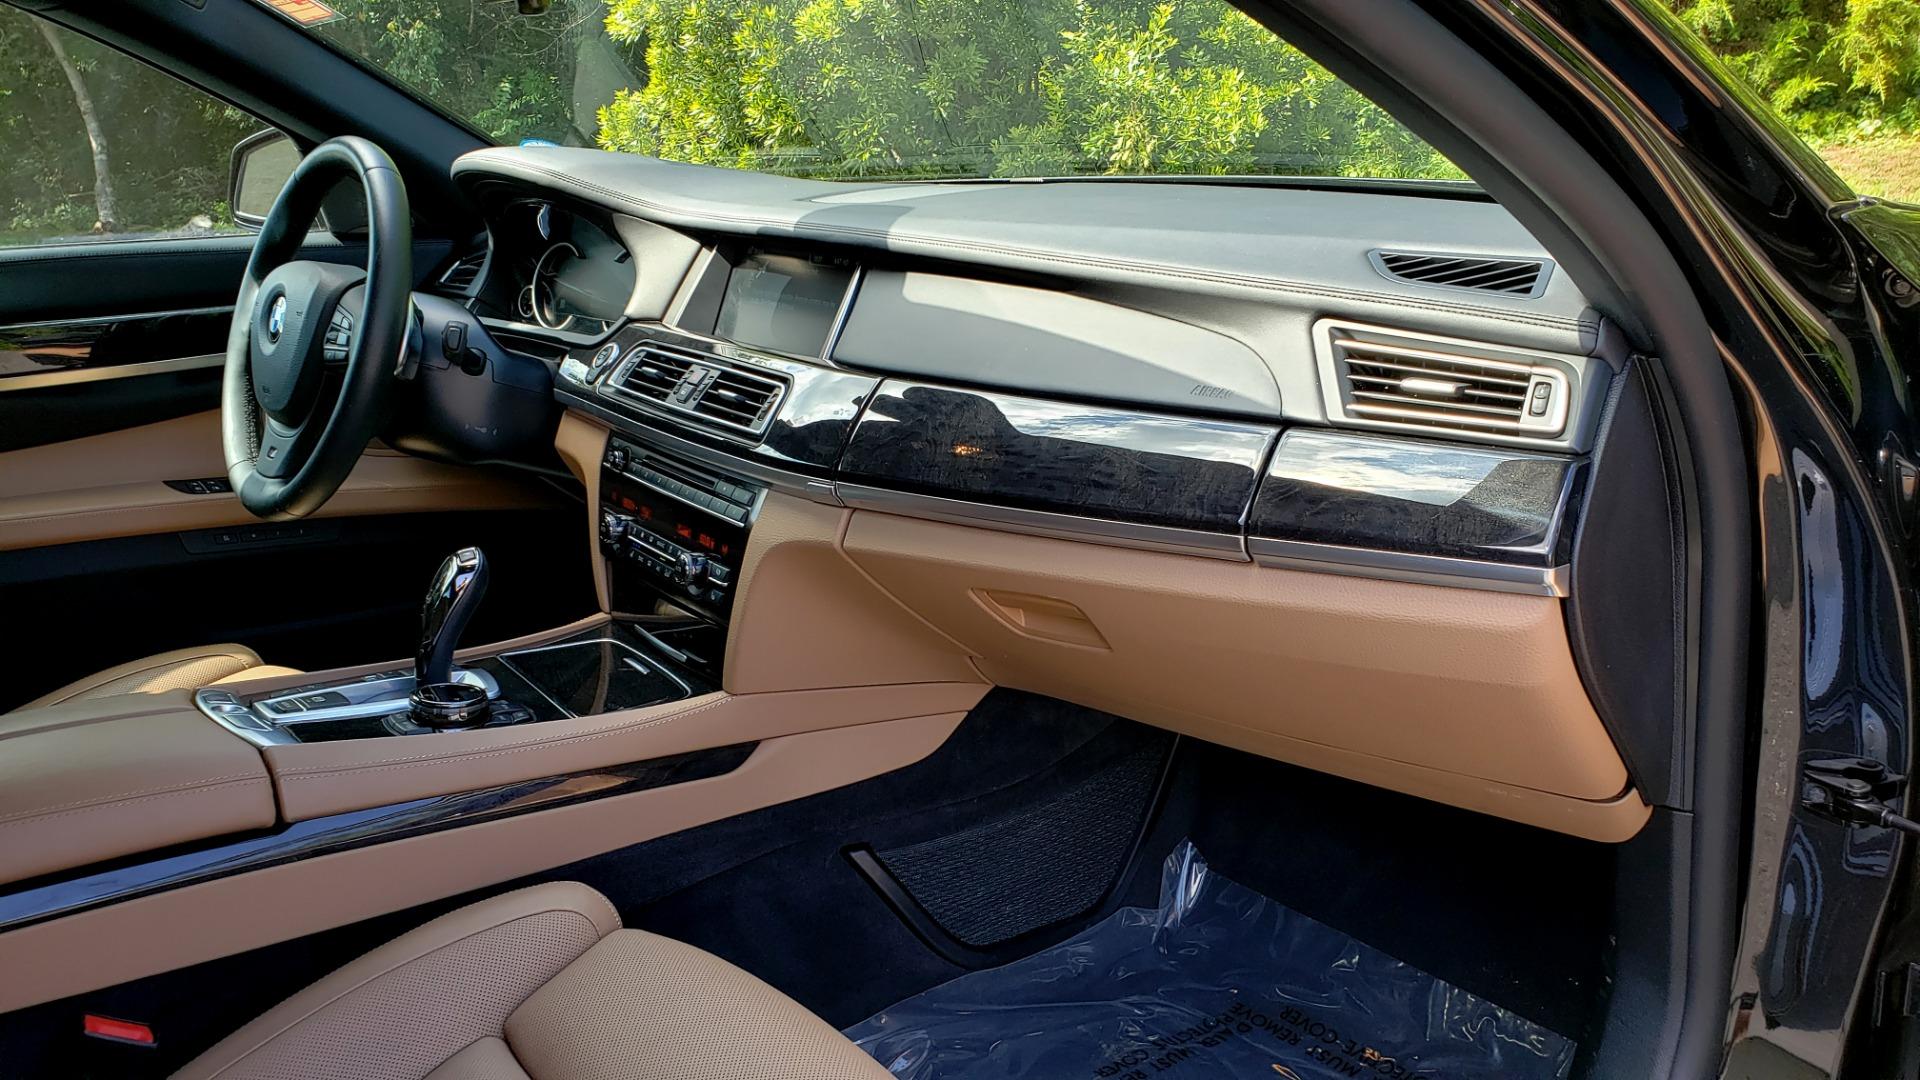 Used 2014 BMW 7 SERIES 750LI M-SPORT / EXEC PKG / DRVR ASST / LIGHTING / NAV / SUNROOF for sale Sold at Formula Imports in Charlotte NC 28227 65